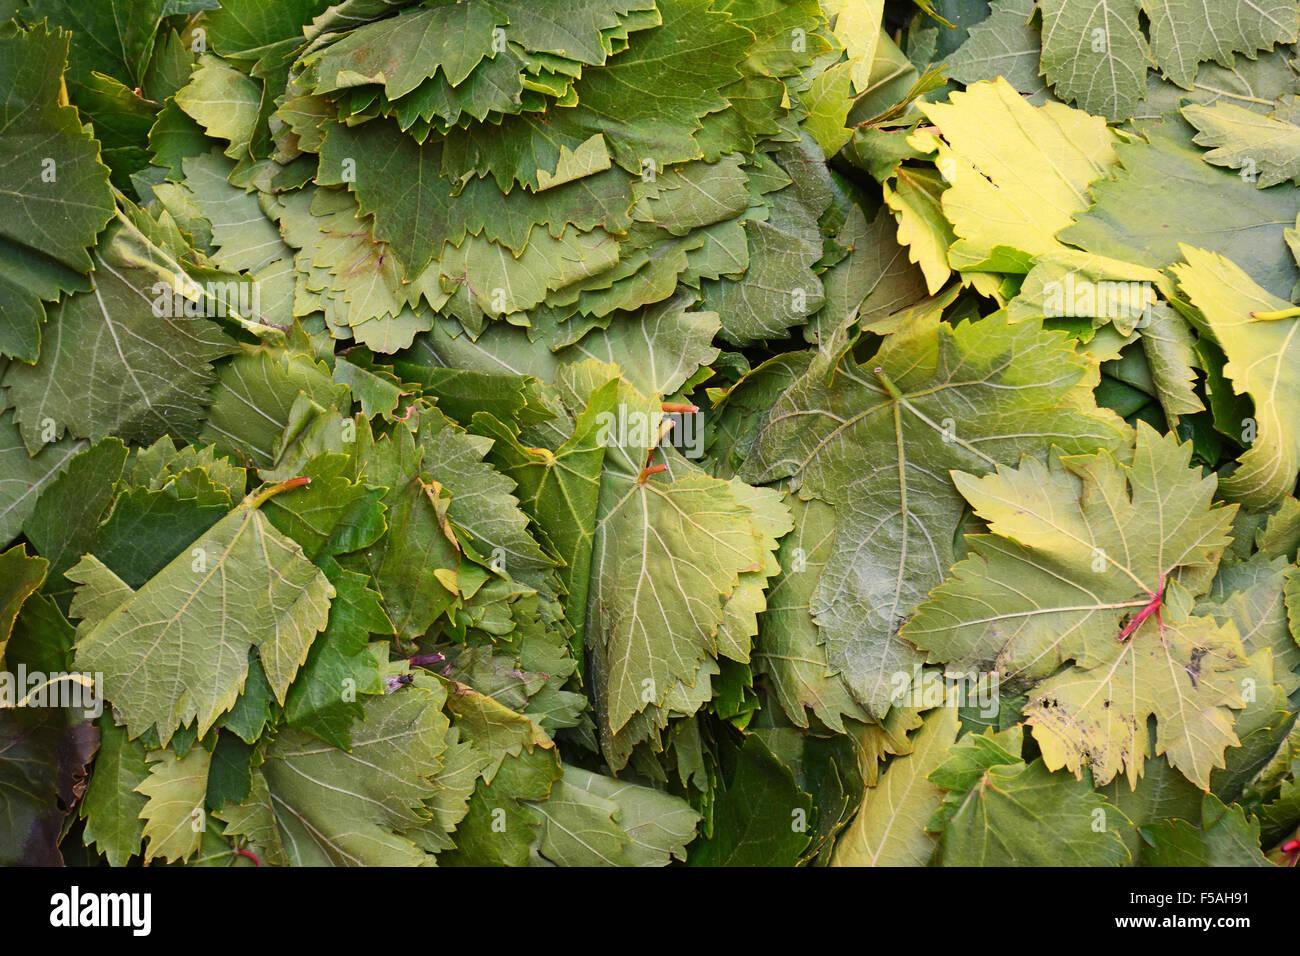 Vine leaves - Stock Image